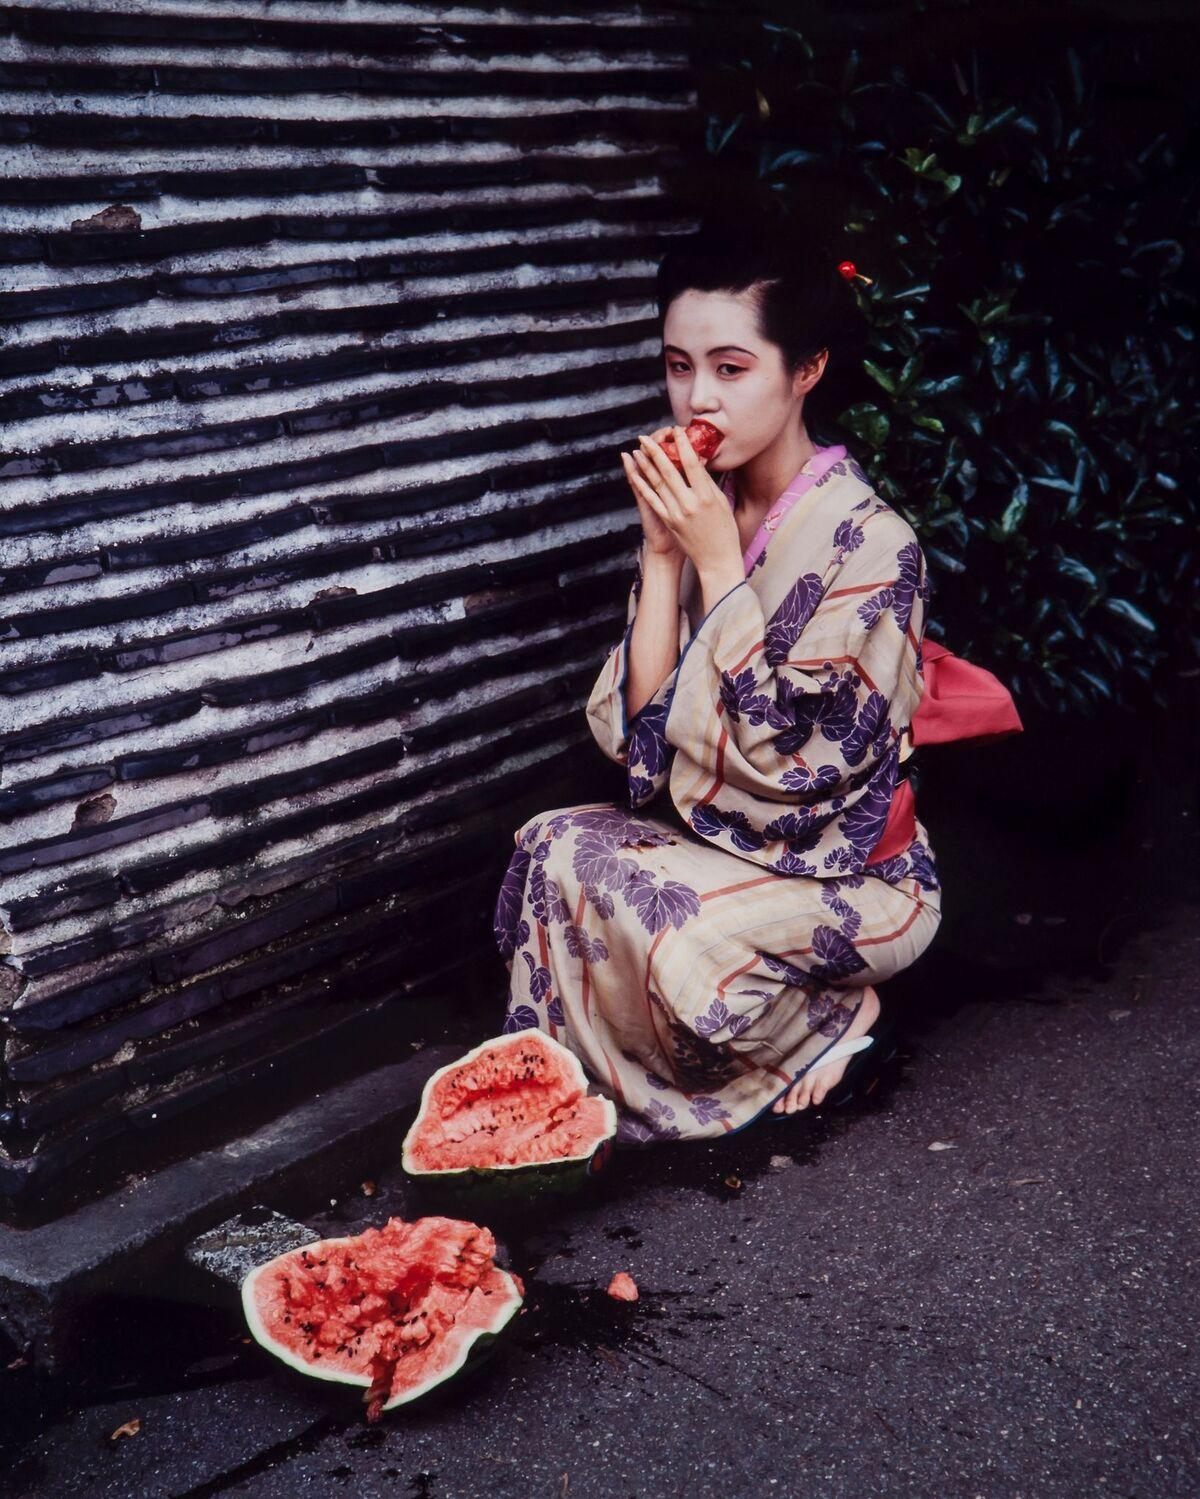 Nobuyoshi Araki, Colourscapes, 1991. Courtesy of the Museum of Sex.